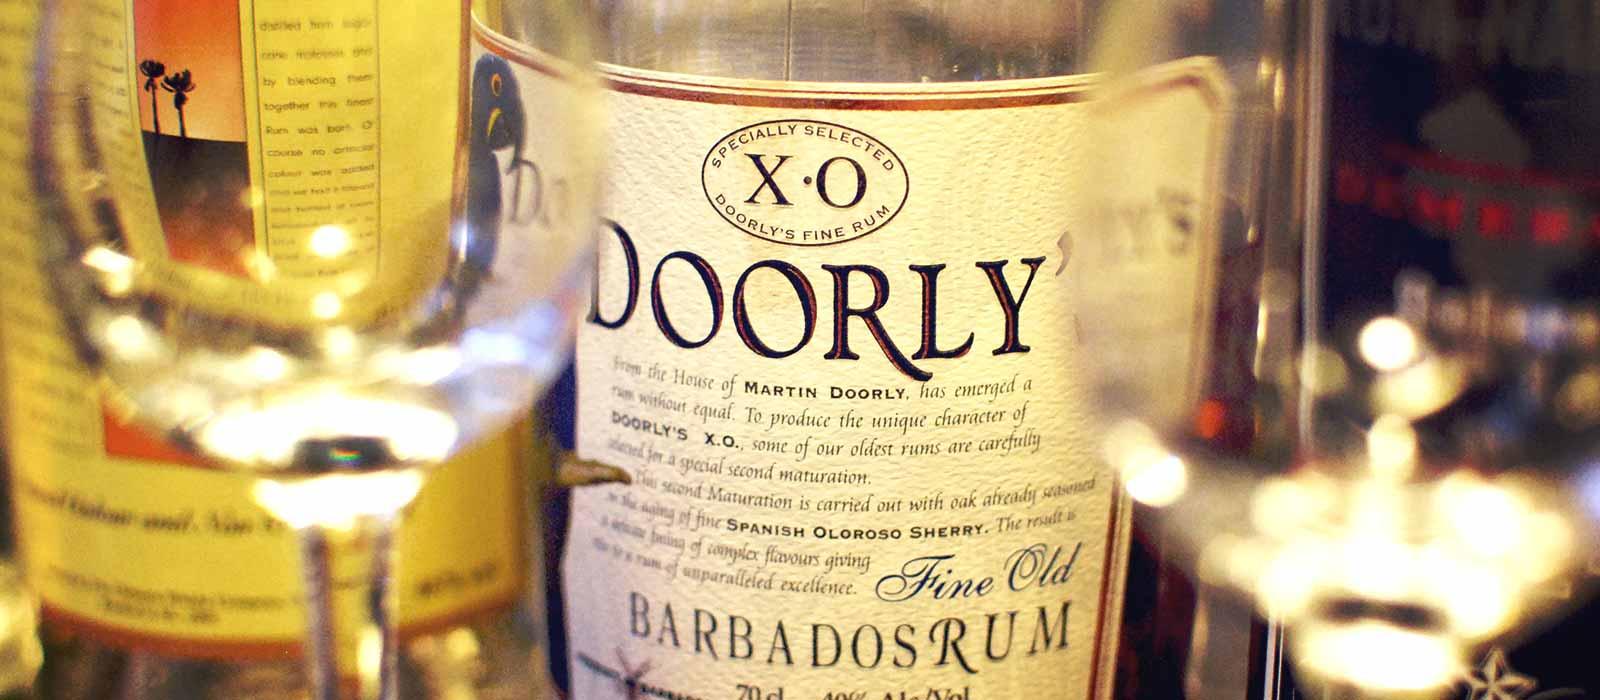 Nionde plats 2015: Doorly's XO